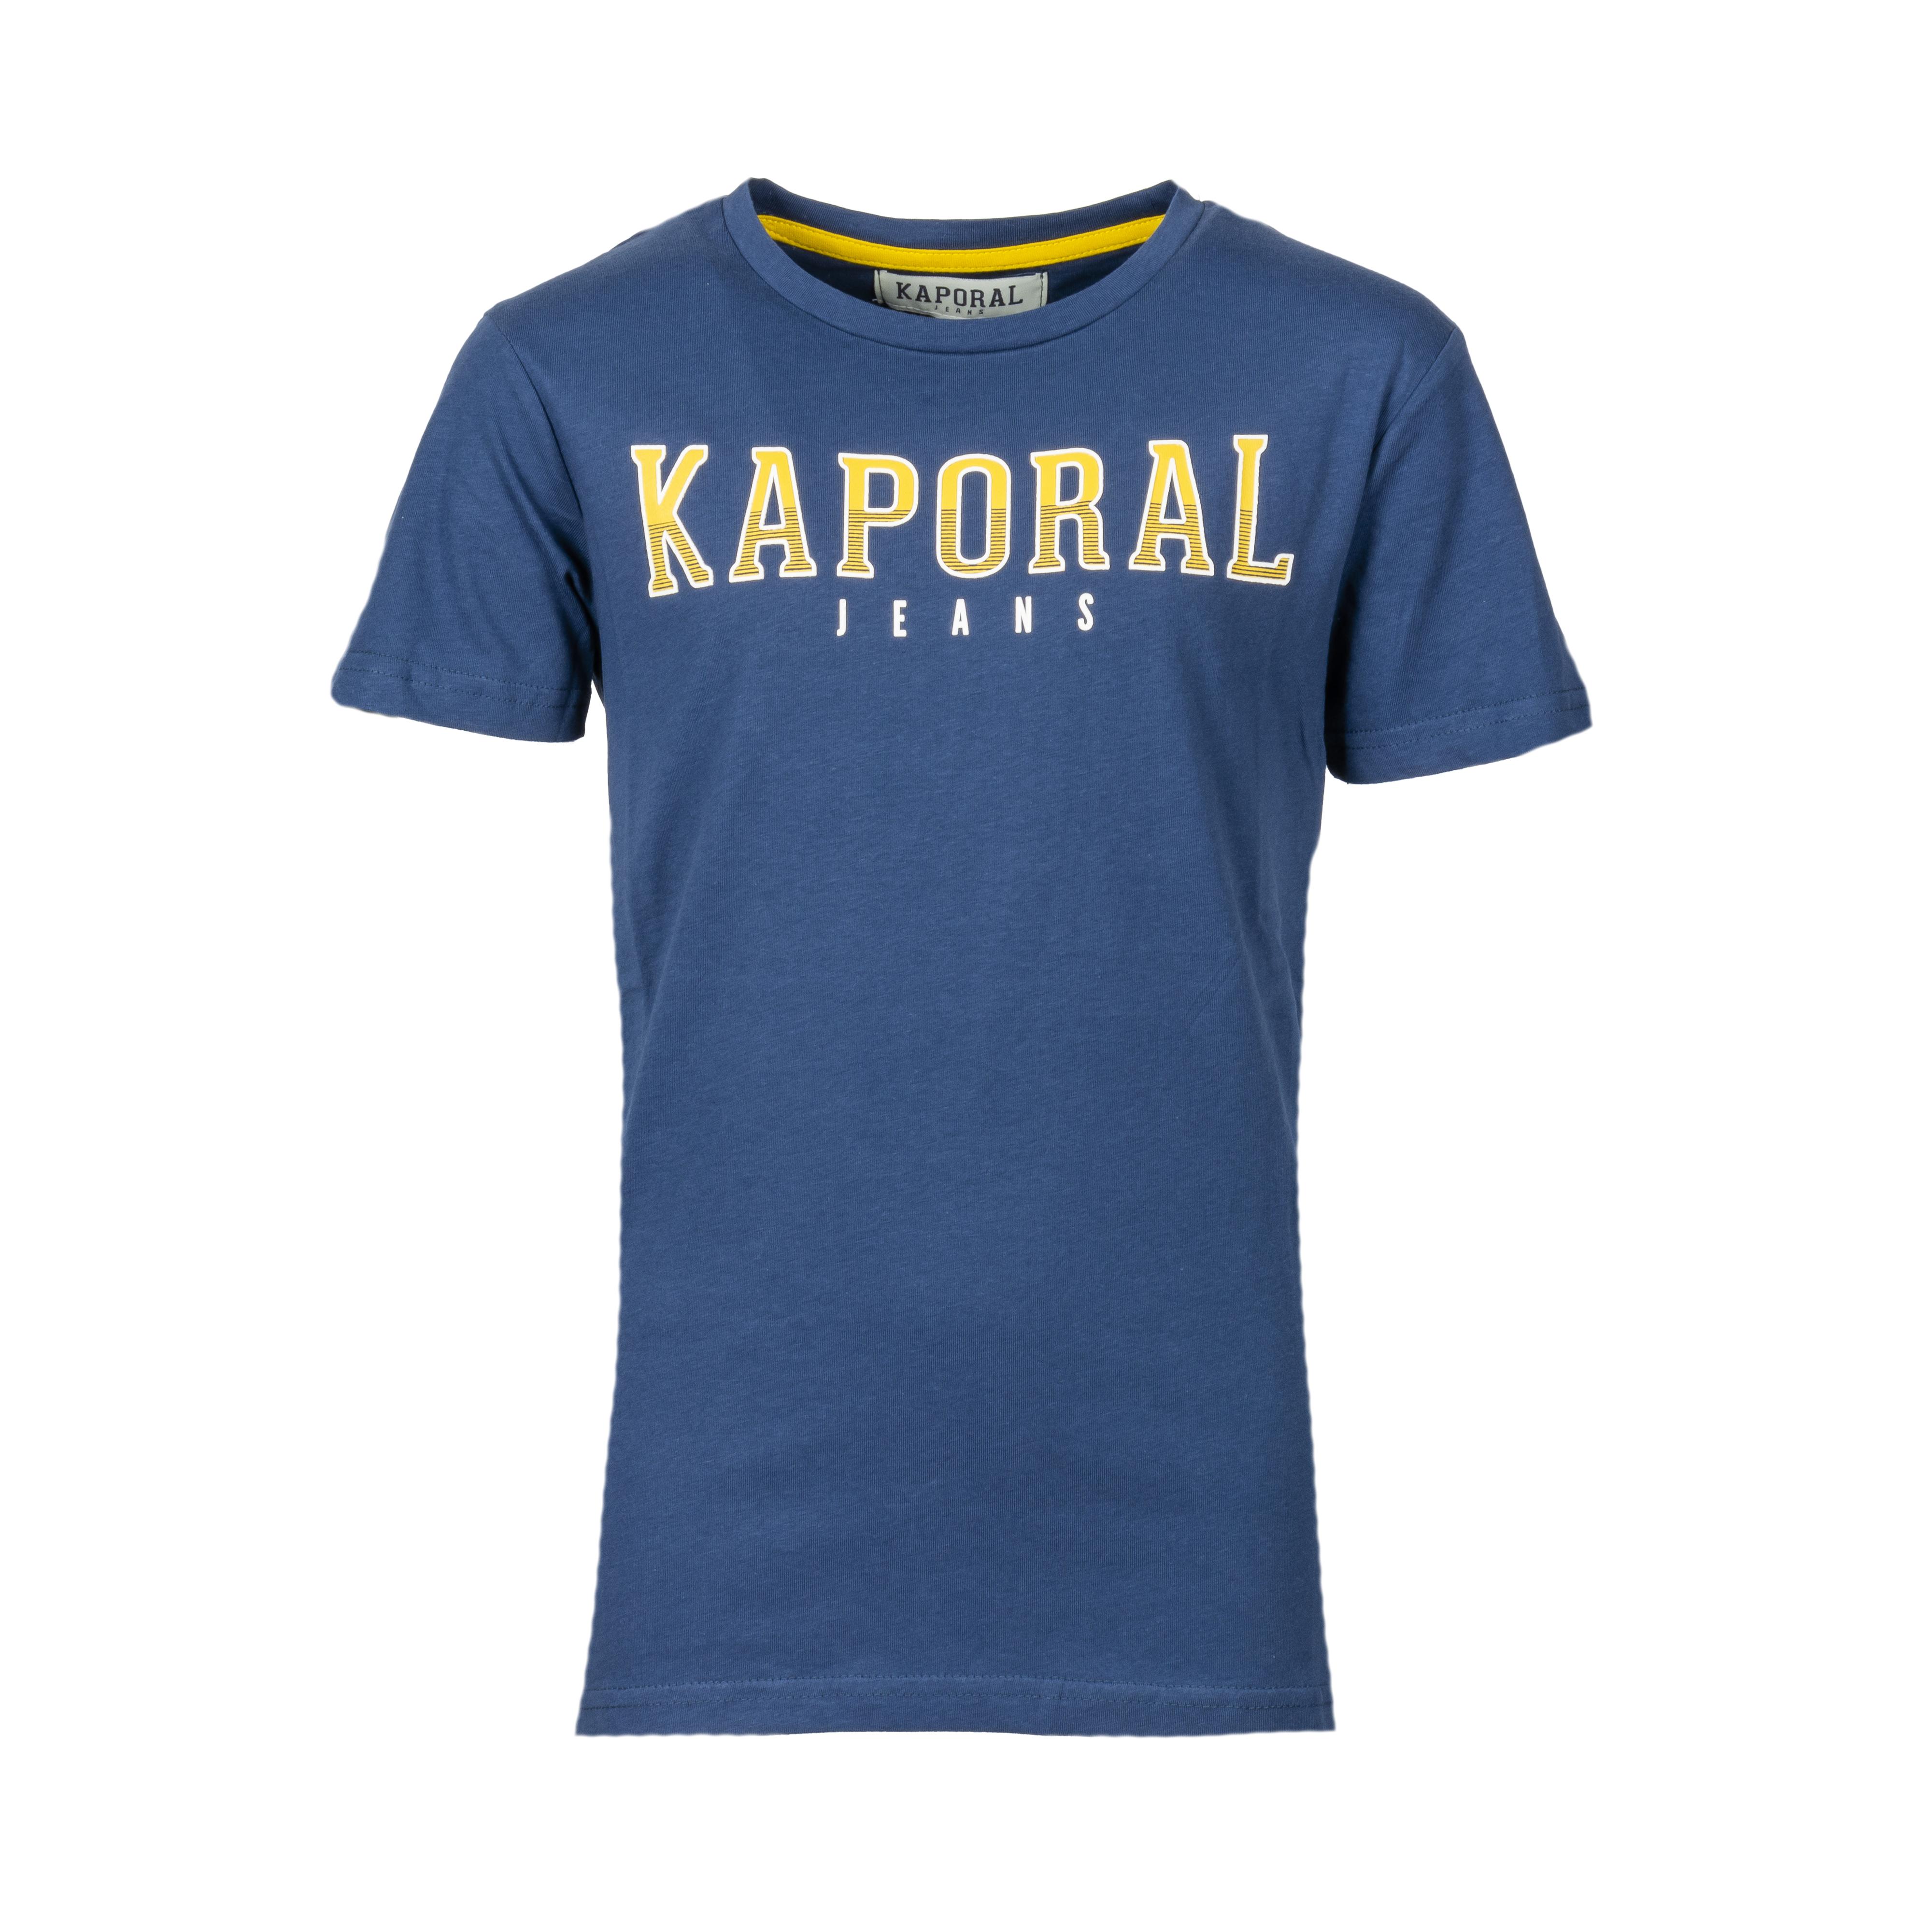 Tee-shirt col rond kaporal enard en coton bleu marine imprimé jaune